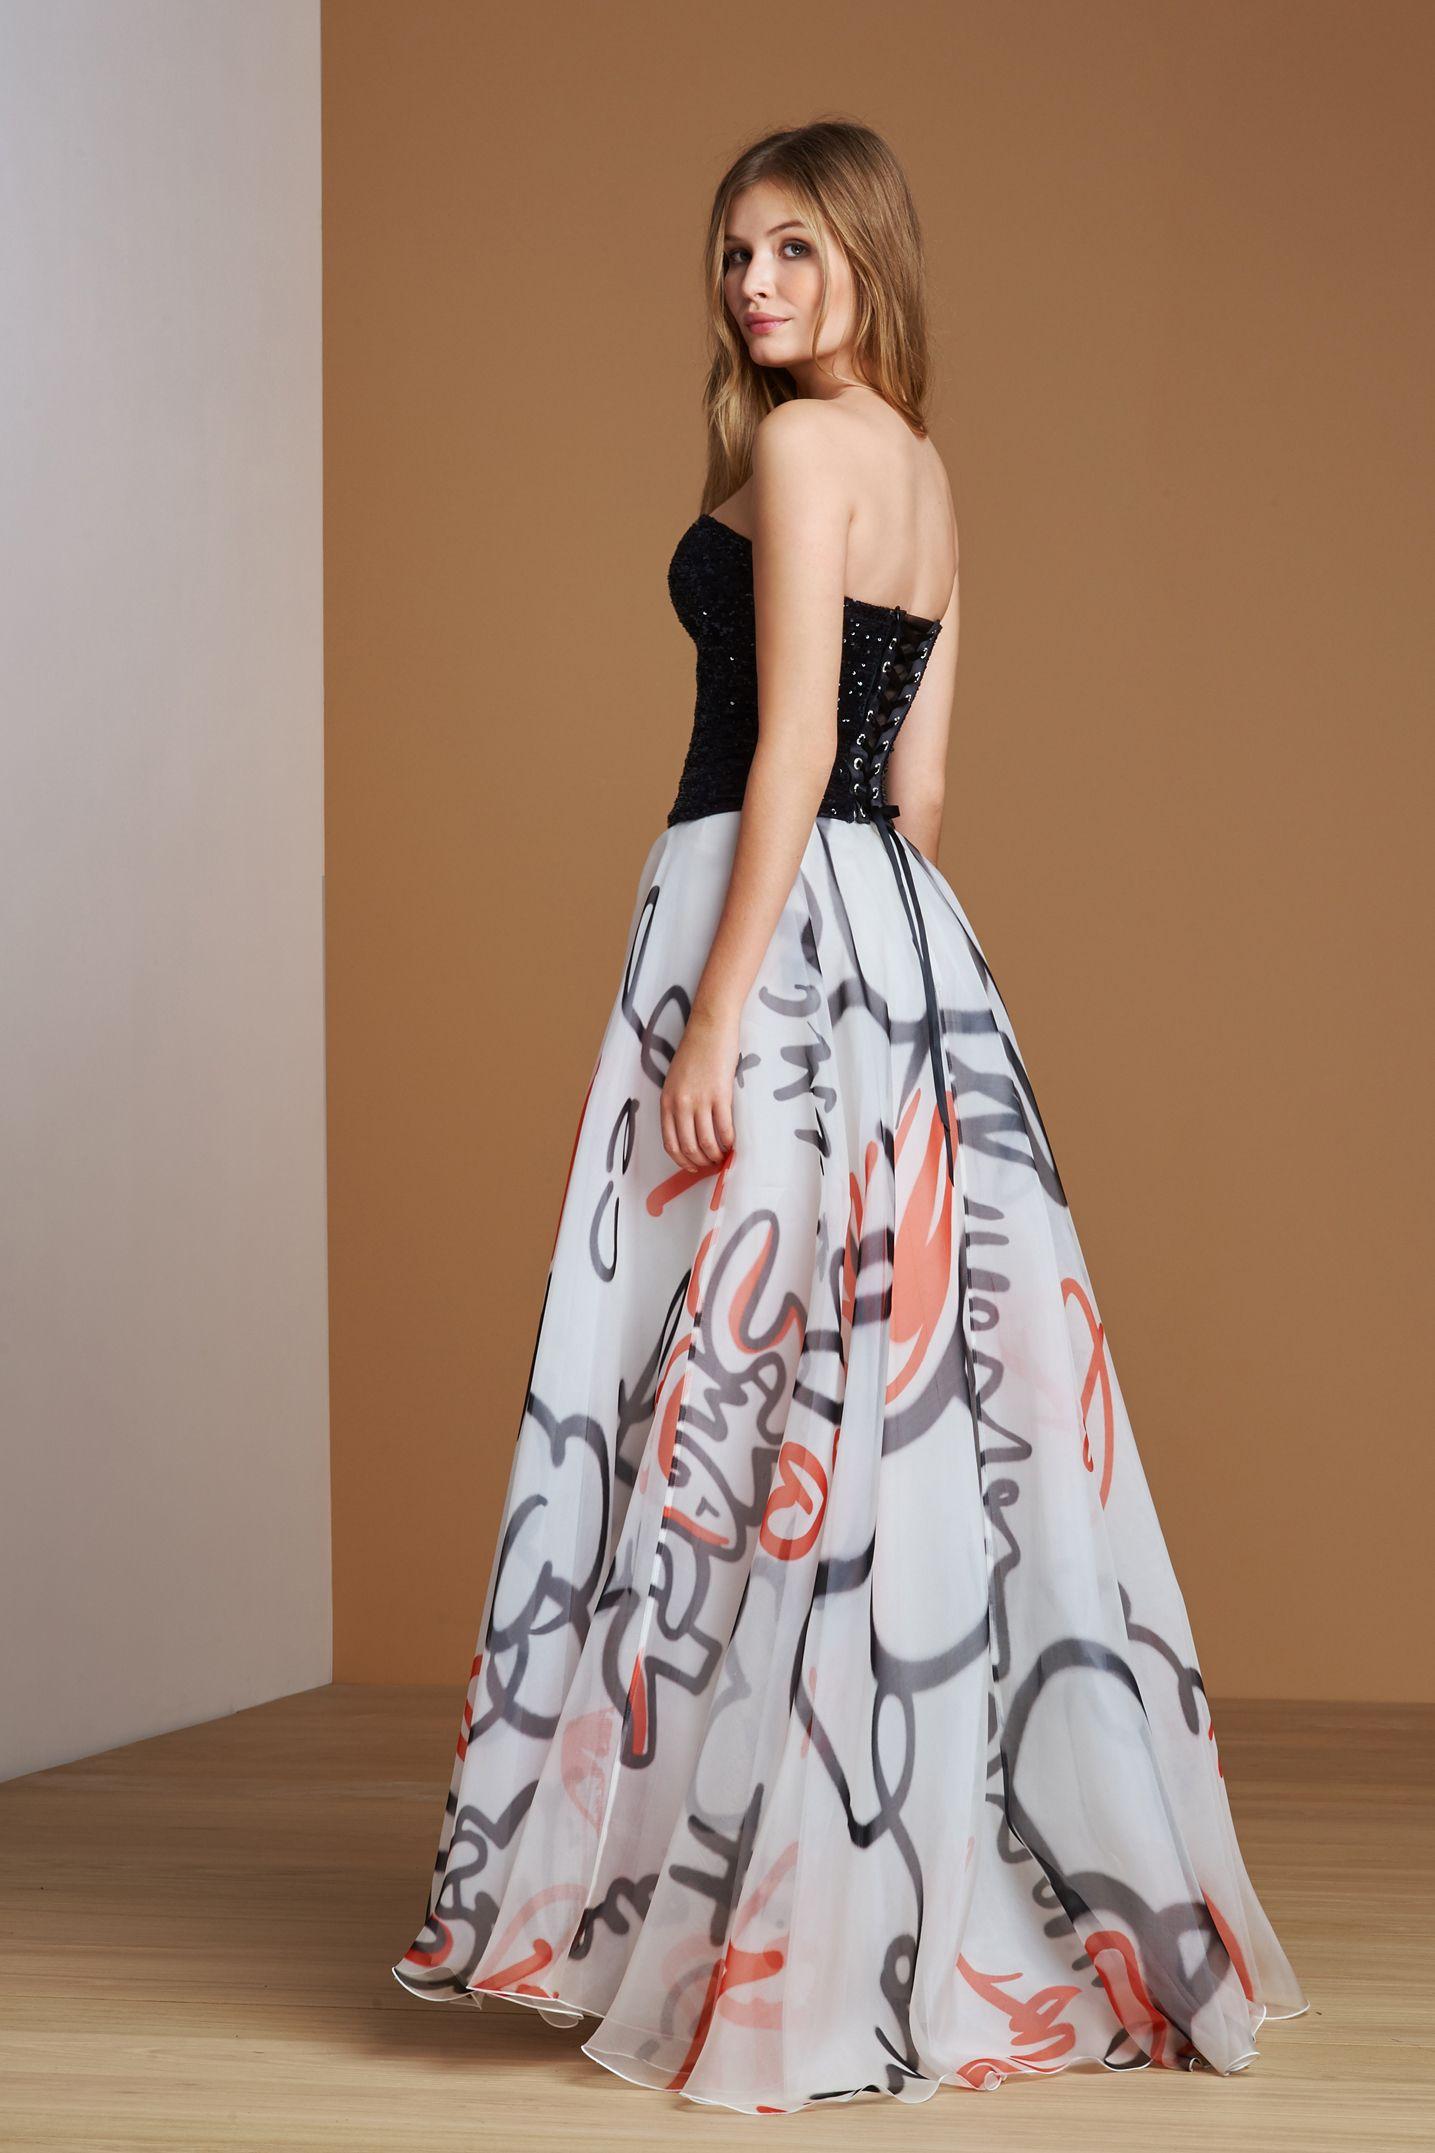 on sale 06afe 33d9d gonna lunga organza di seta atelier eme | CLOTHING, WOW ...